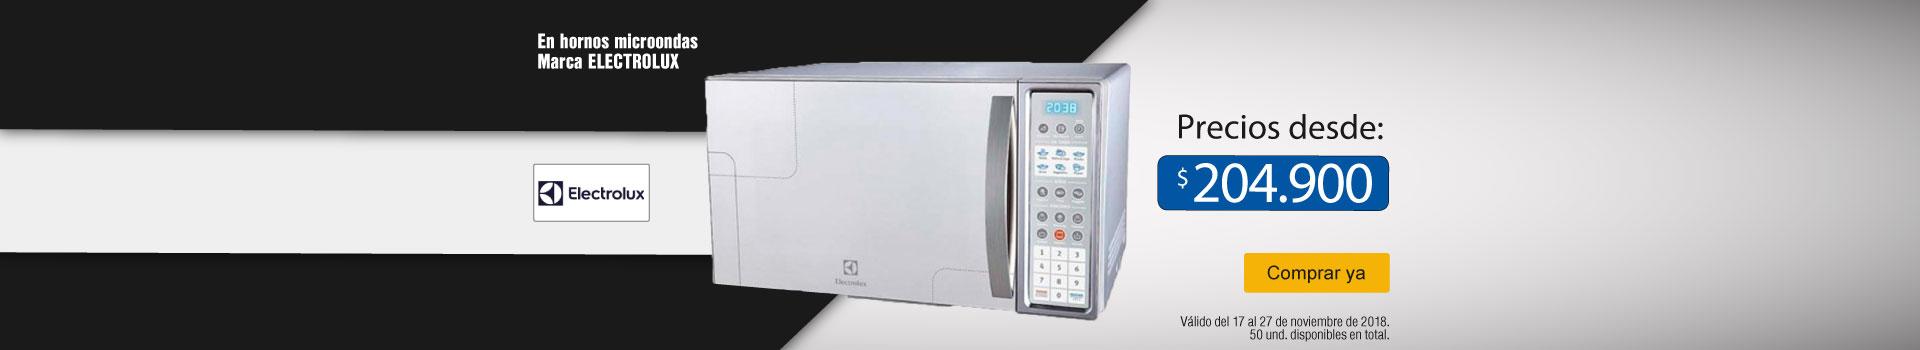 AK-KT-BCAT-2-MENORES-PREPALIM-DCAT-ELECTROLUX-HORNOS-MICROONDAS-NOVIEMBRE-17